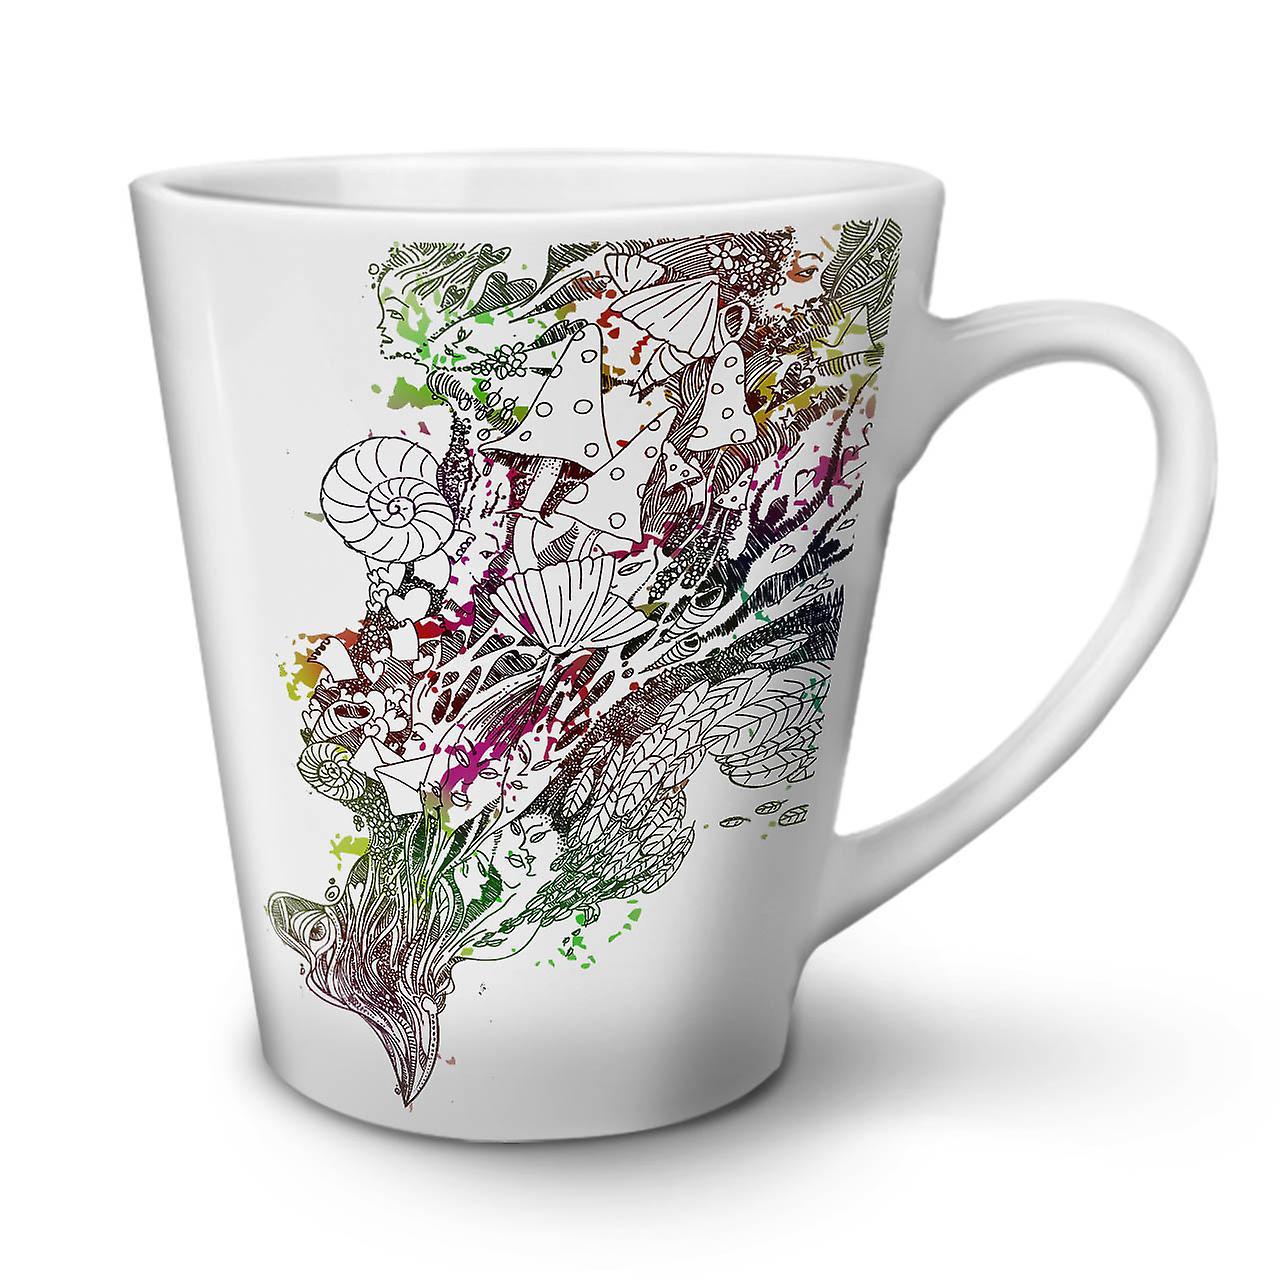 Céramique Nouvelle En Rasta Fantaisie Drogue Tasse Café Latte OzWellcoda Cool 12 Blanche UqzMLSGjpV